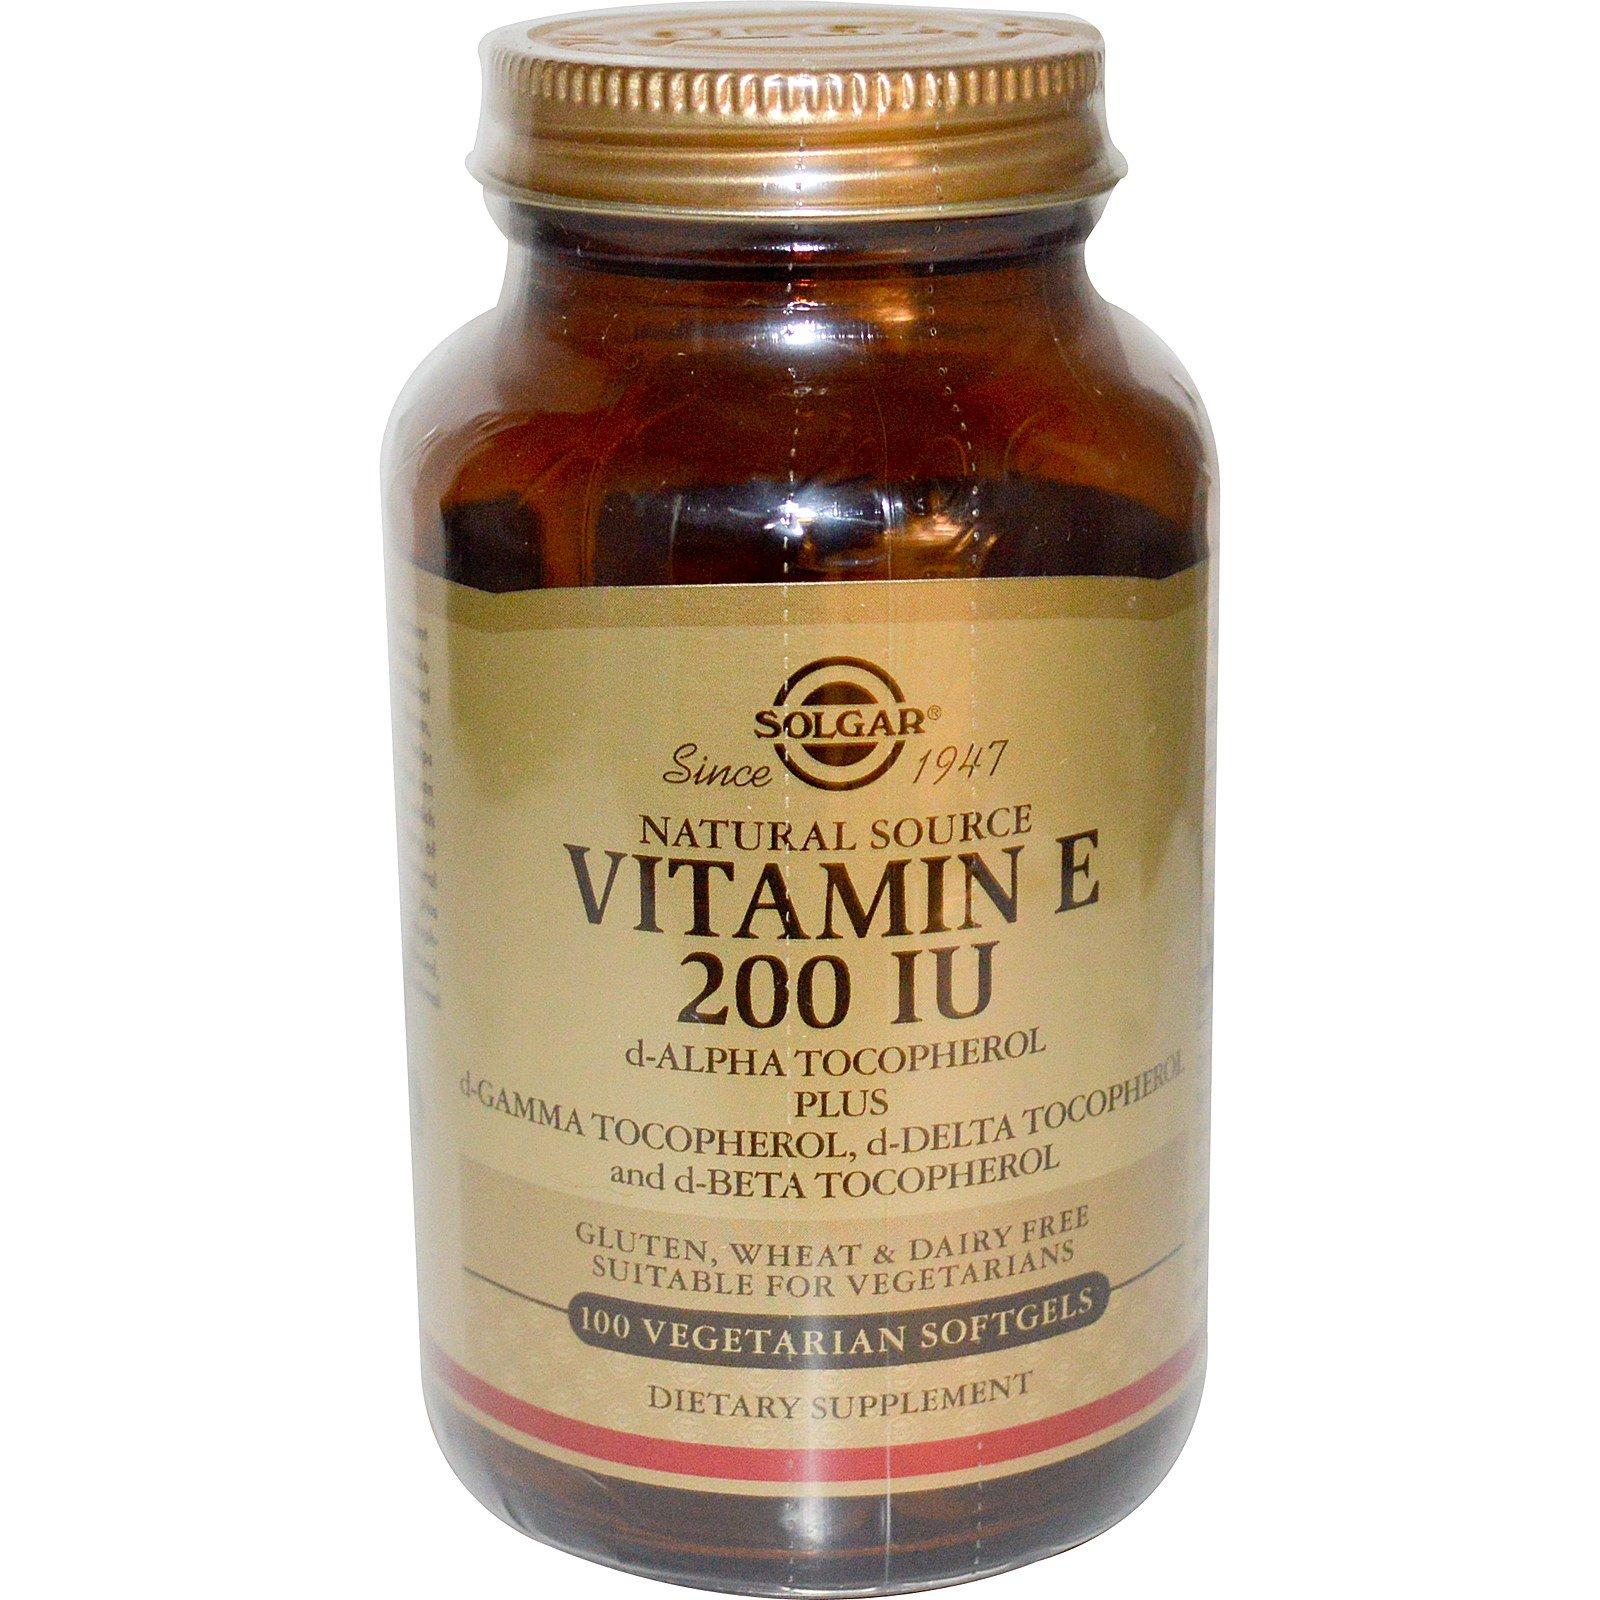 Solgar, Vitamin E, 200 IU, 100 Veg Softgels